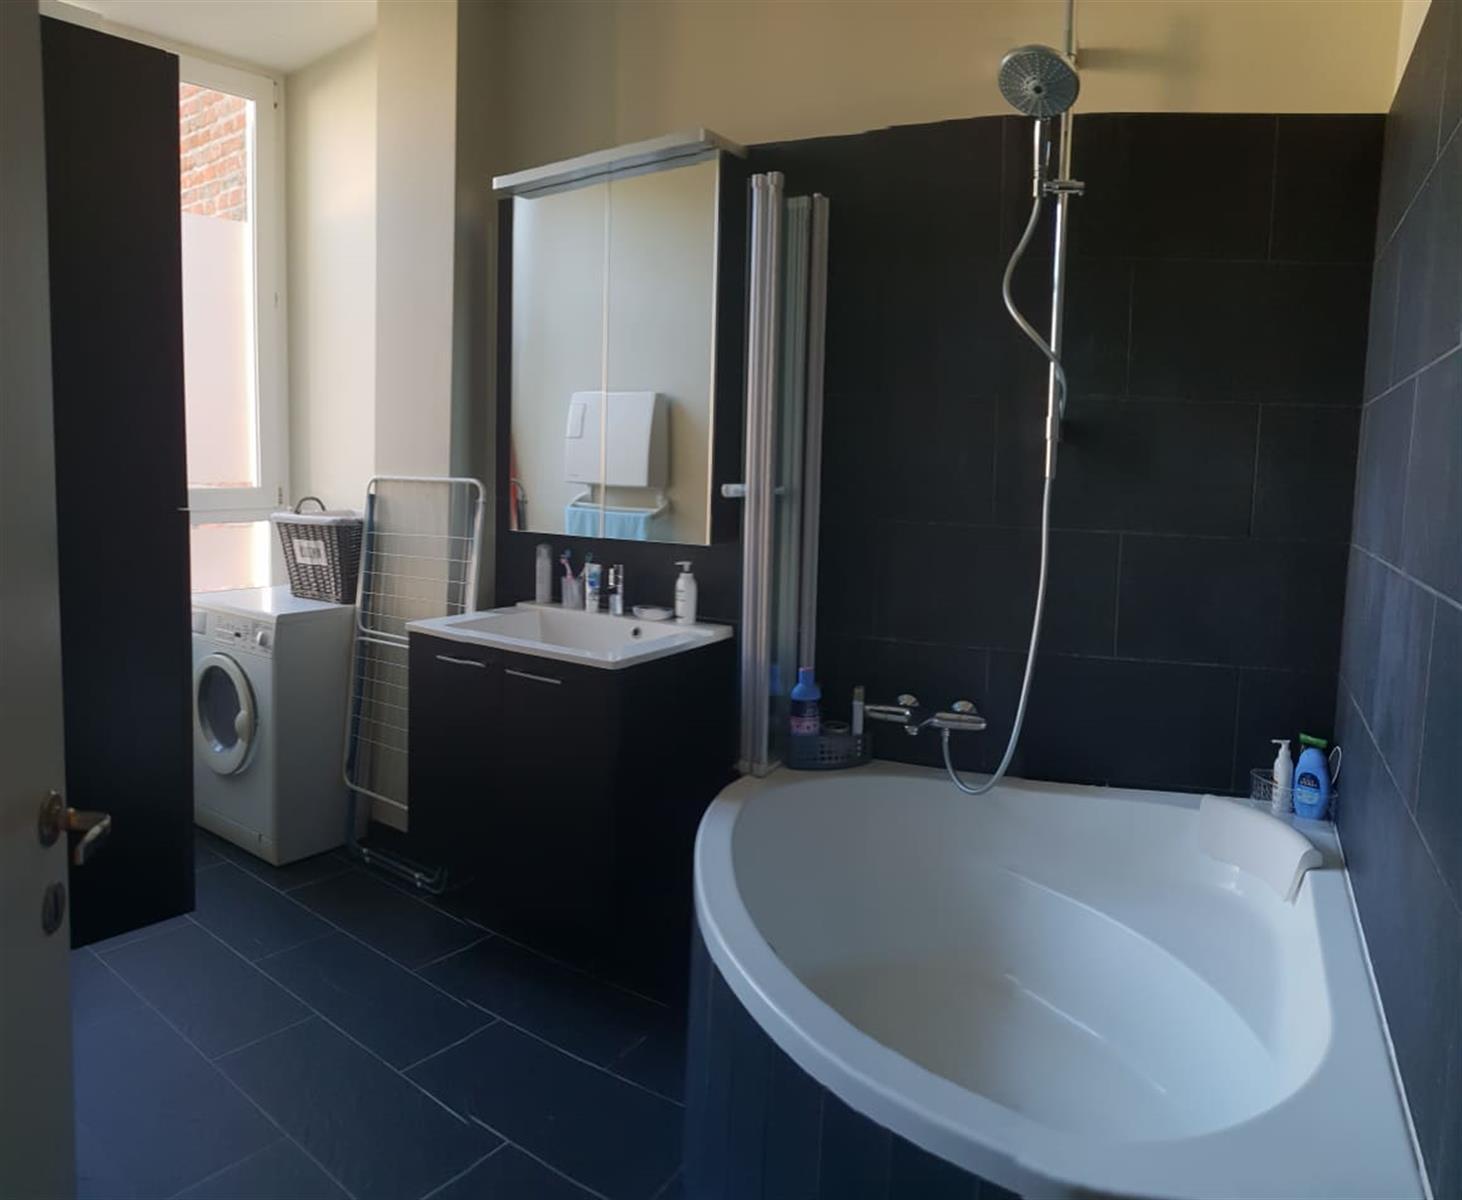 Appartement - Woluwe-Saint-Lambert - #4162898-9